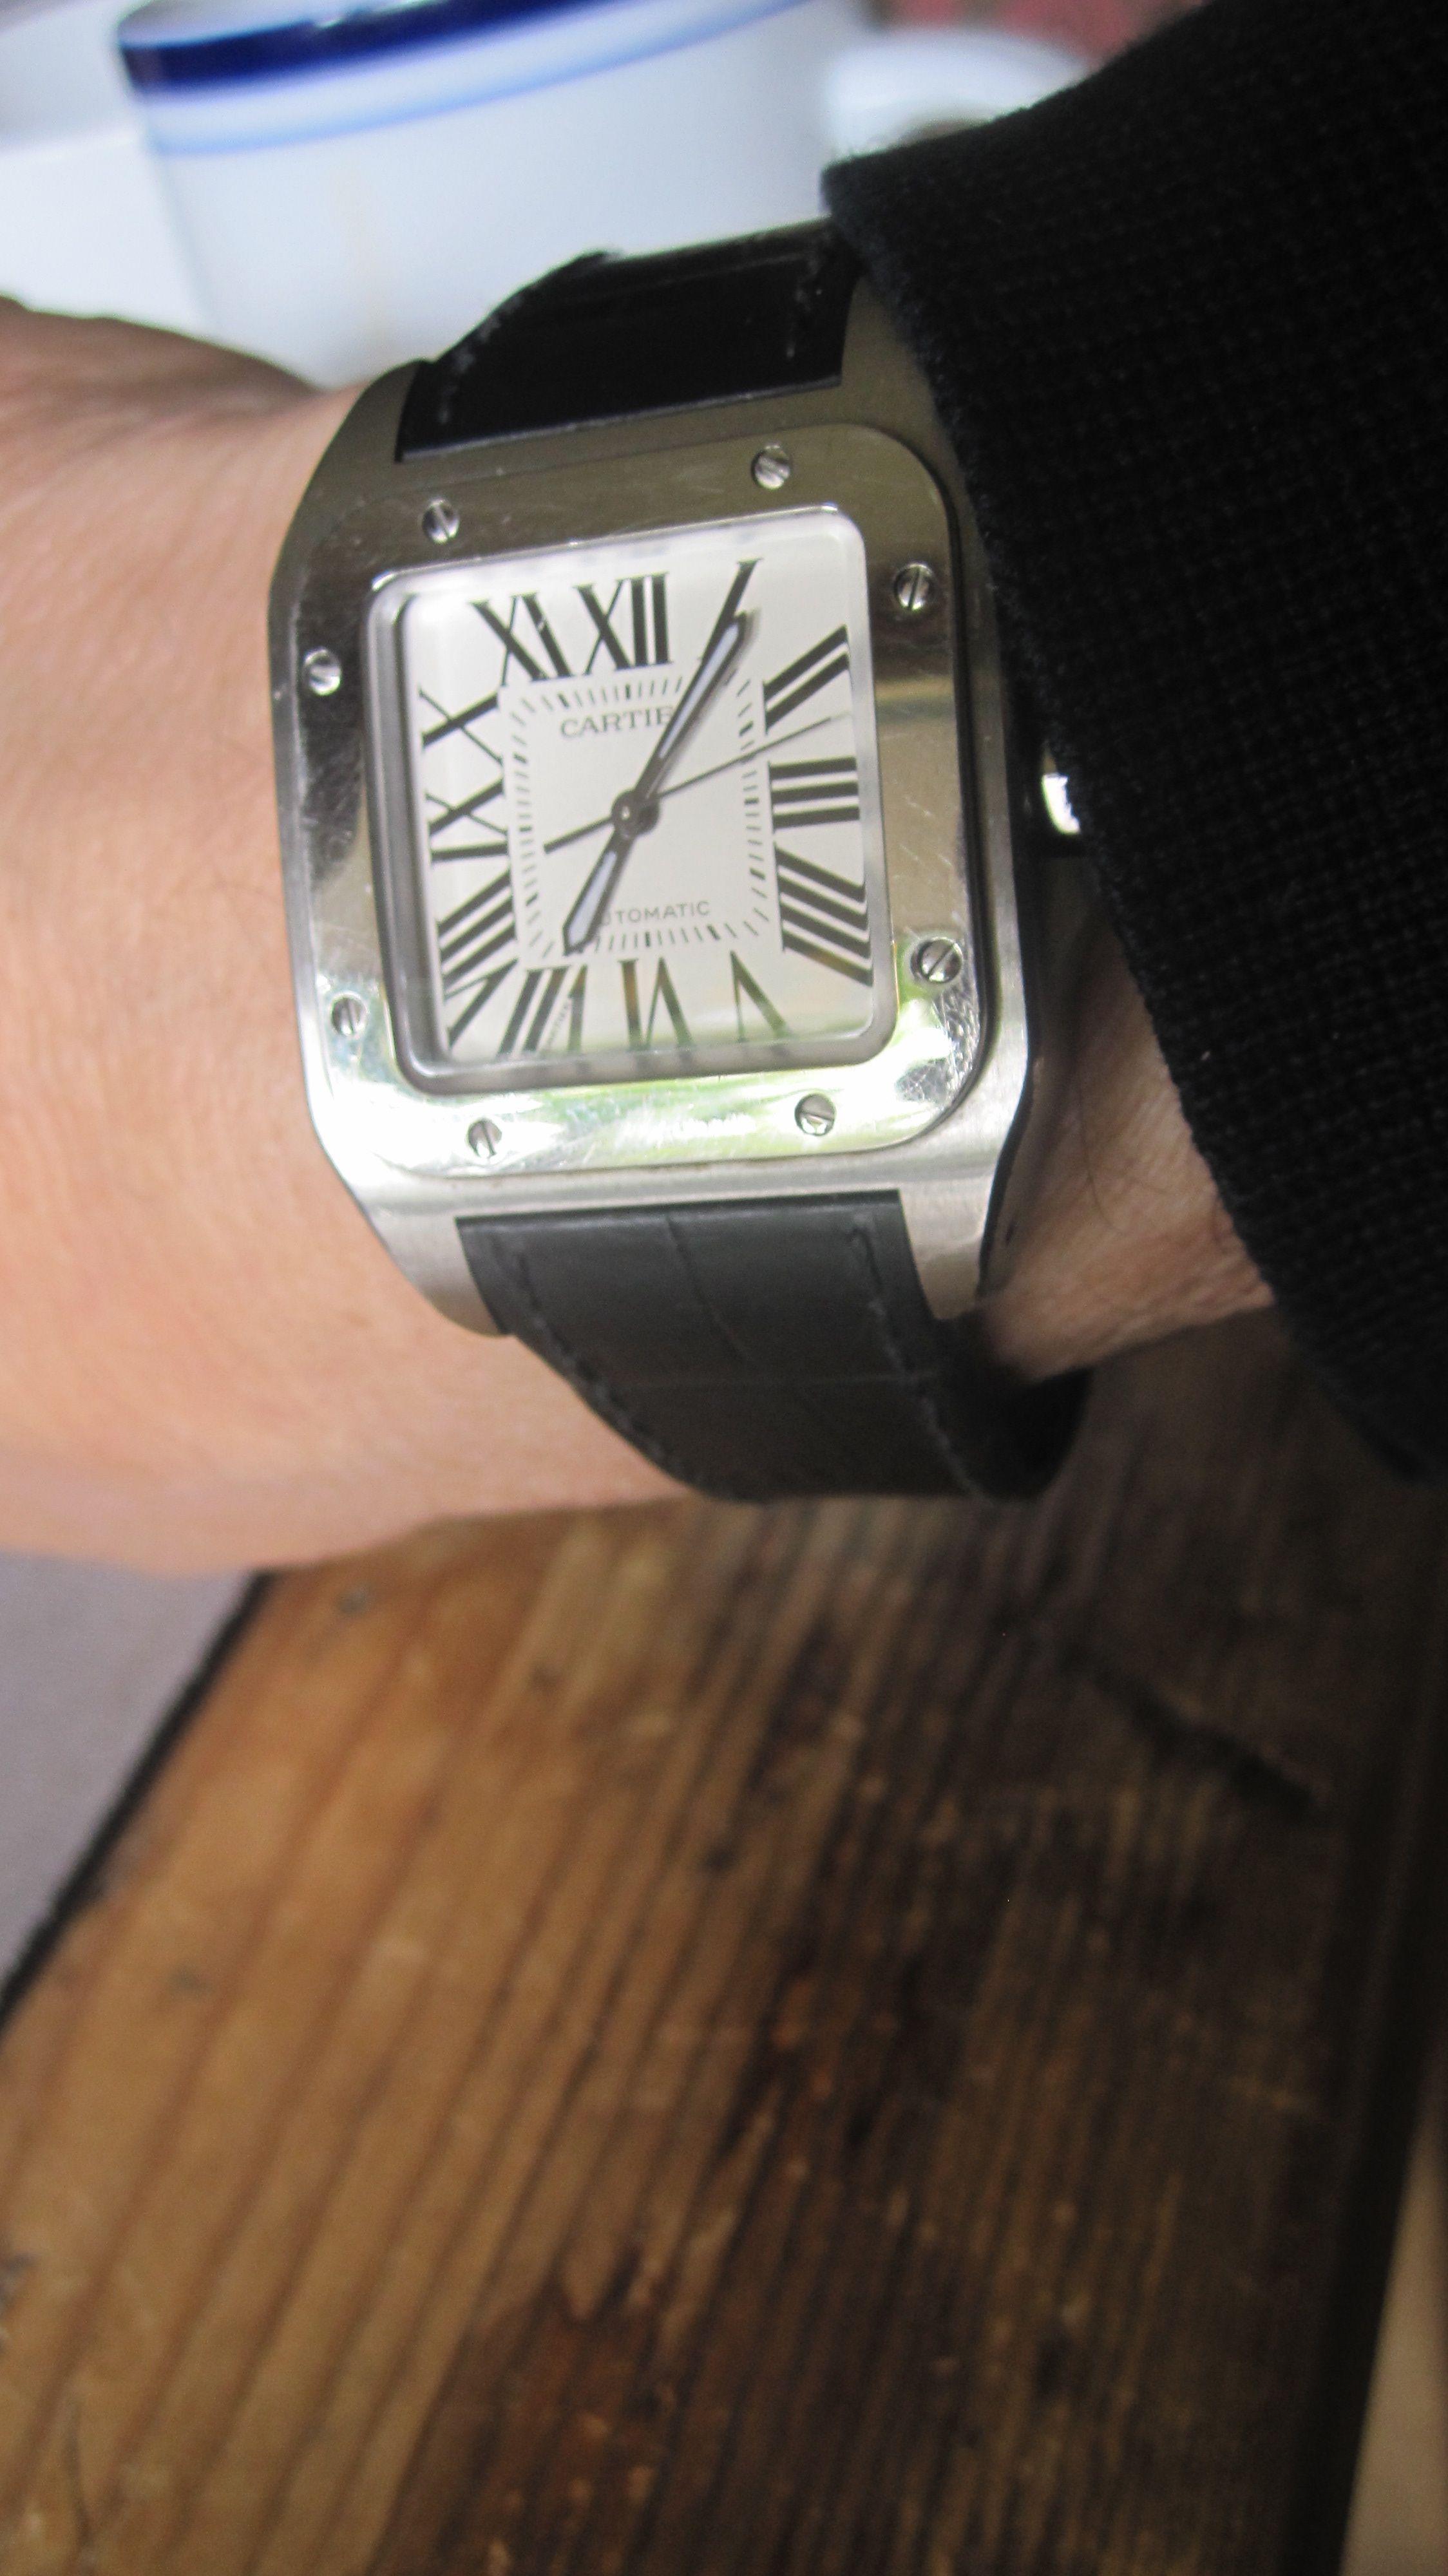 Joe's favorite watch: The Cartier Santos 100.